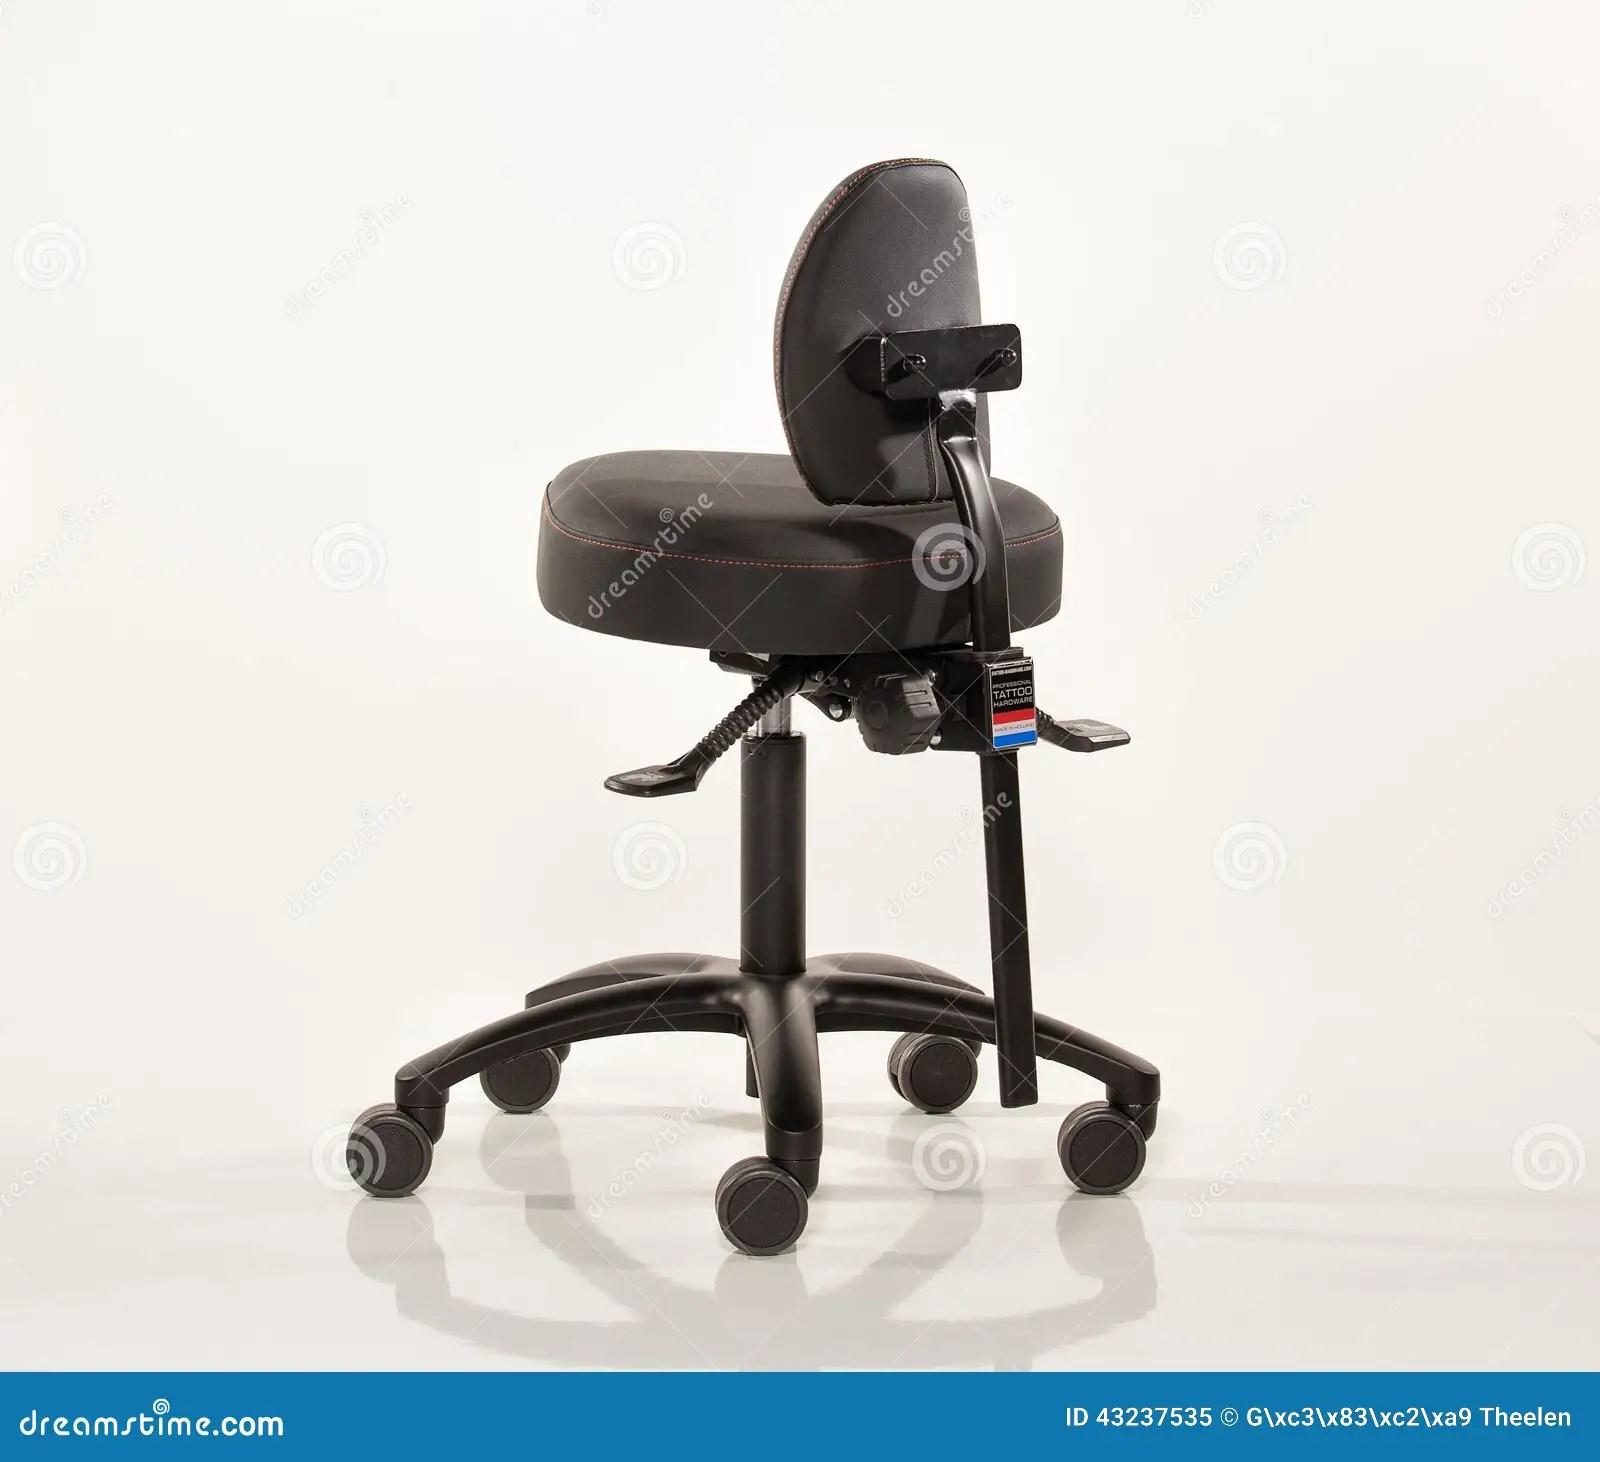 tattoo artist chair herman miller air stock image of steel blackframe 43237535 in leather on weels